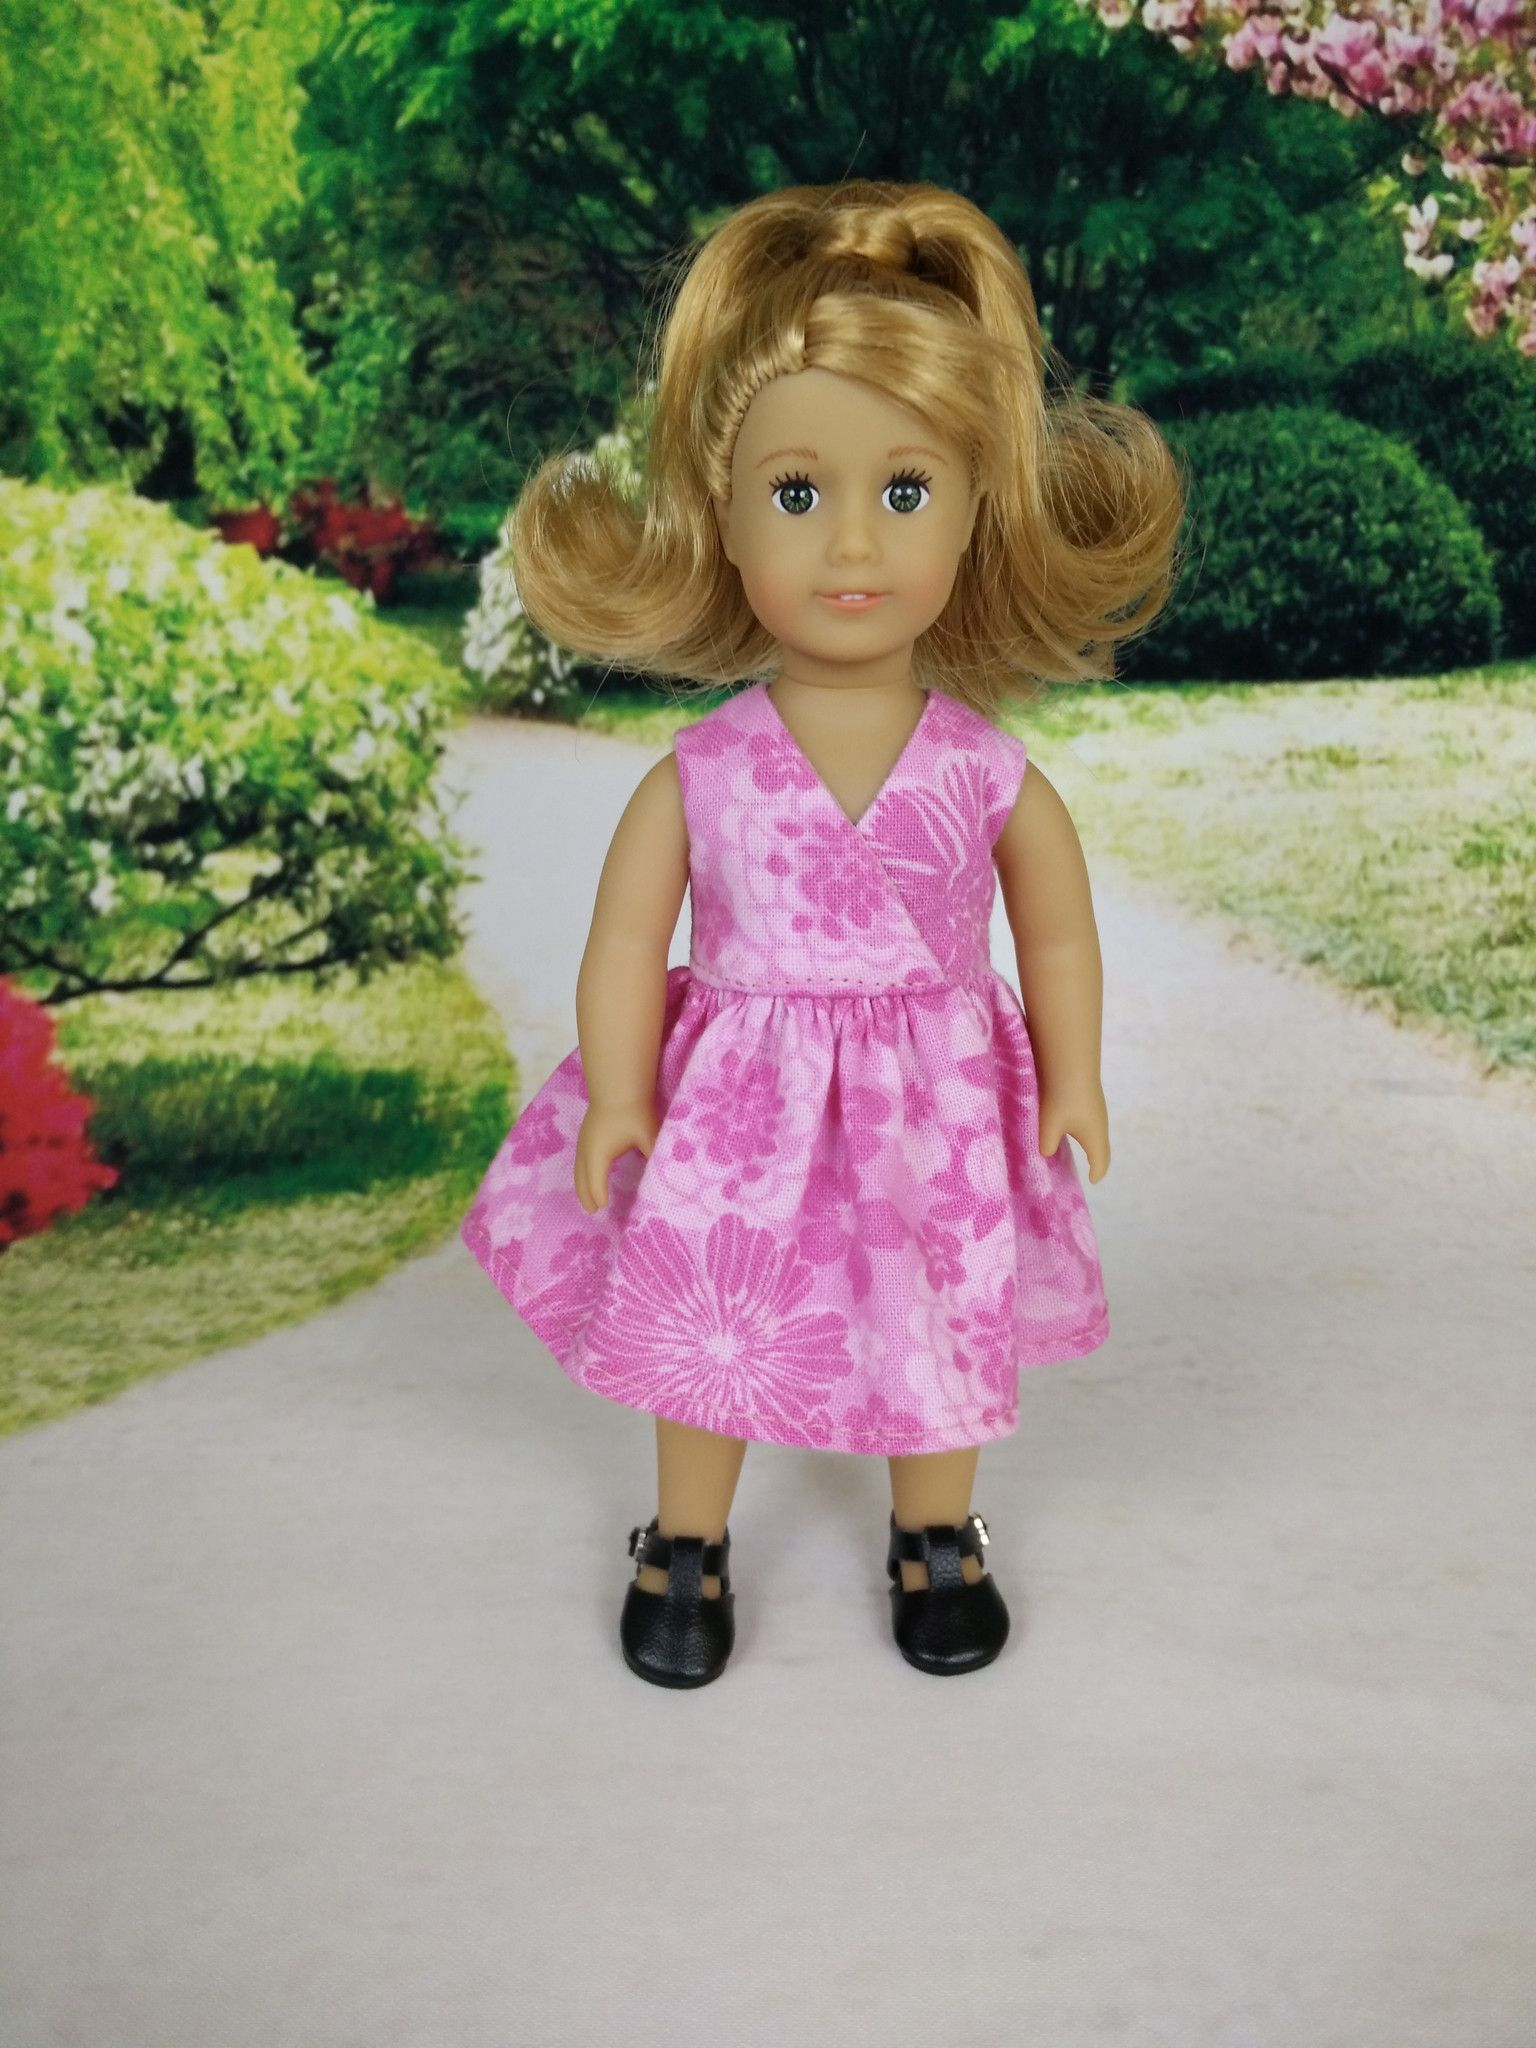 Wrap dress for American Girl mini dolls 02